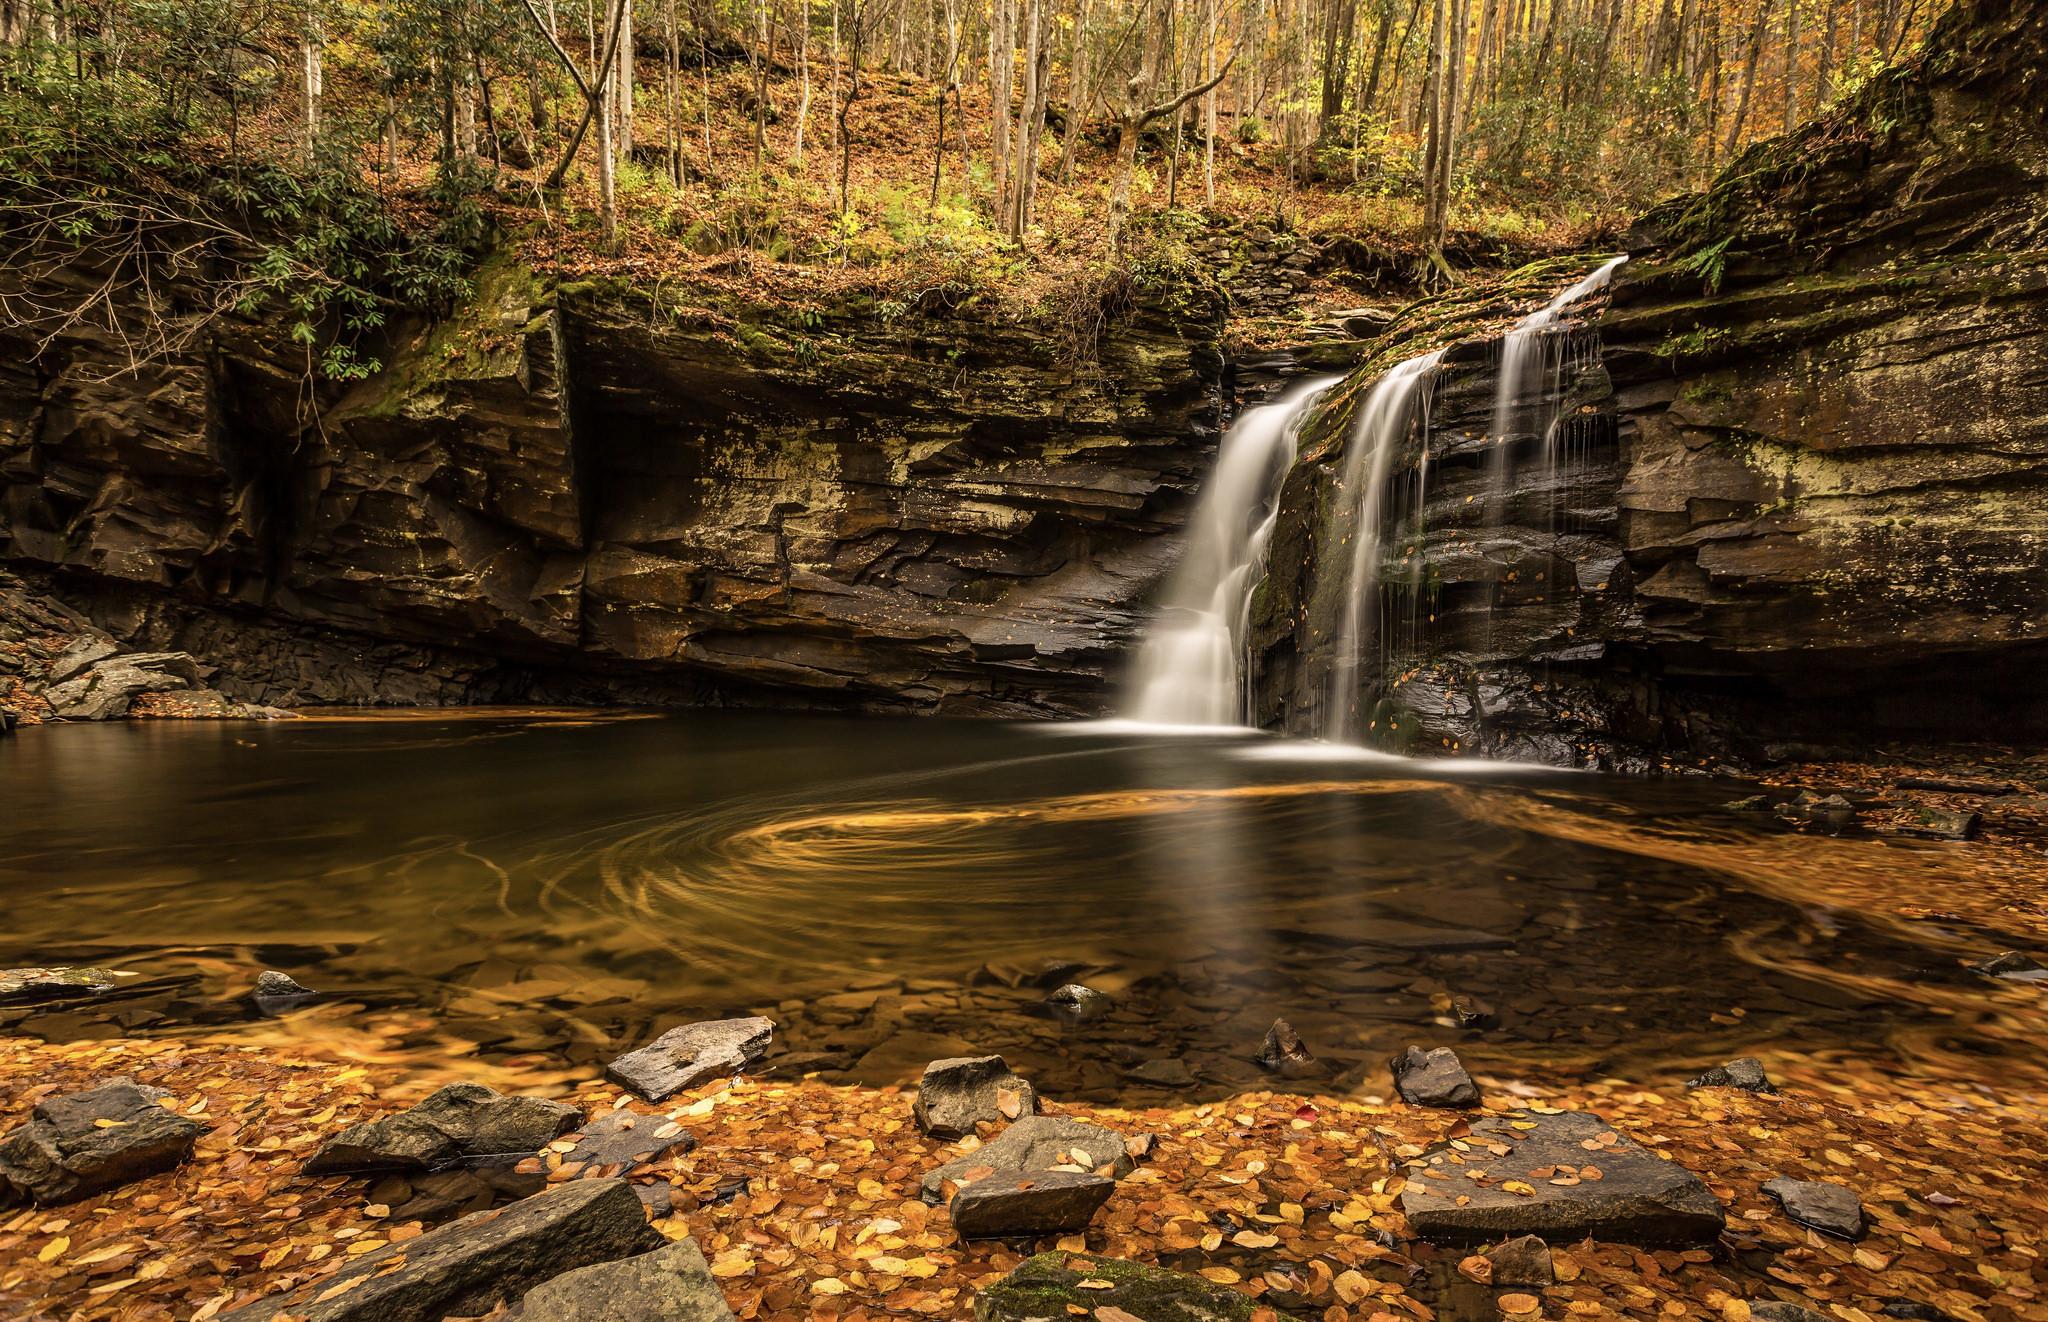 The falls at Seneca Rocks